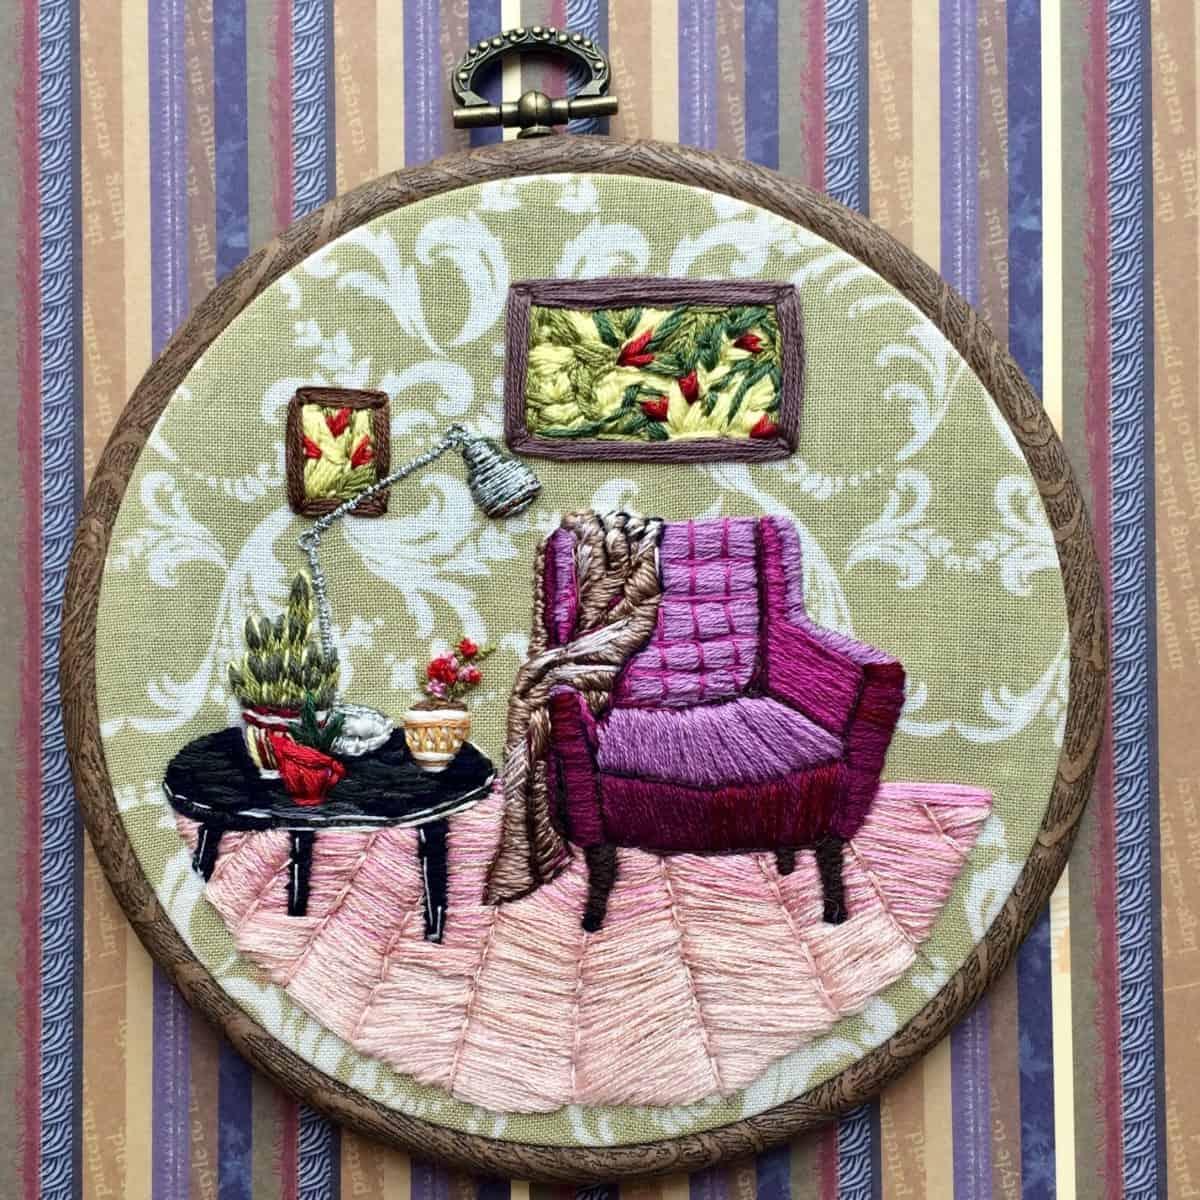 embroidery designs elena moart 4